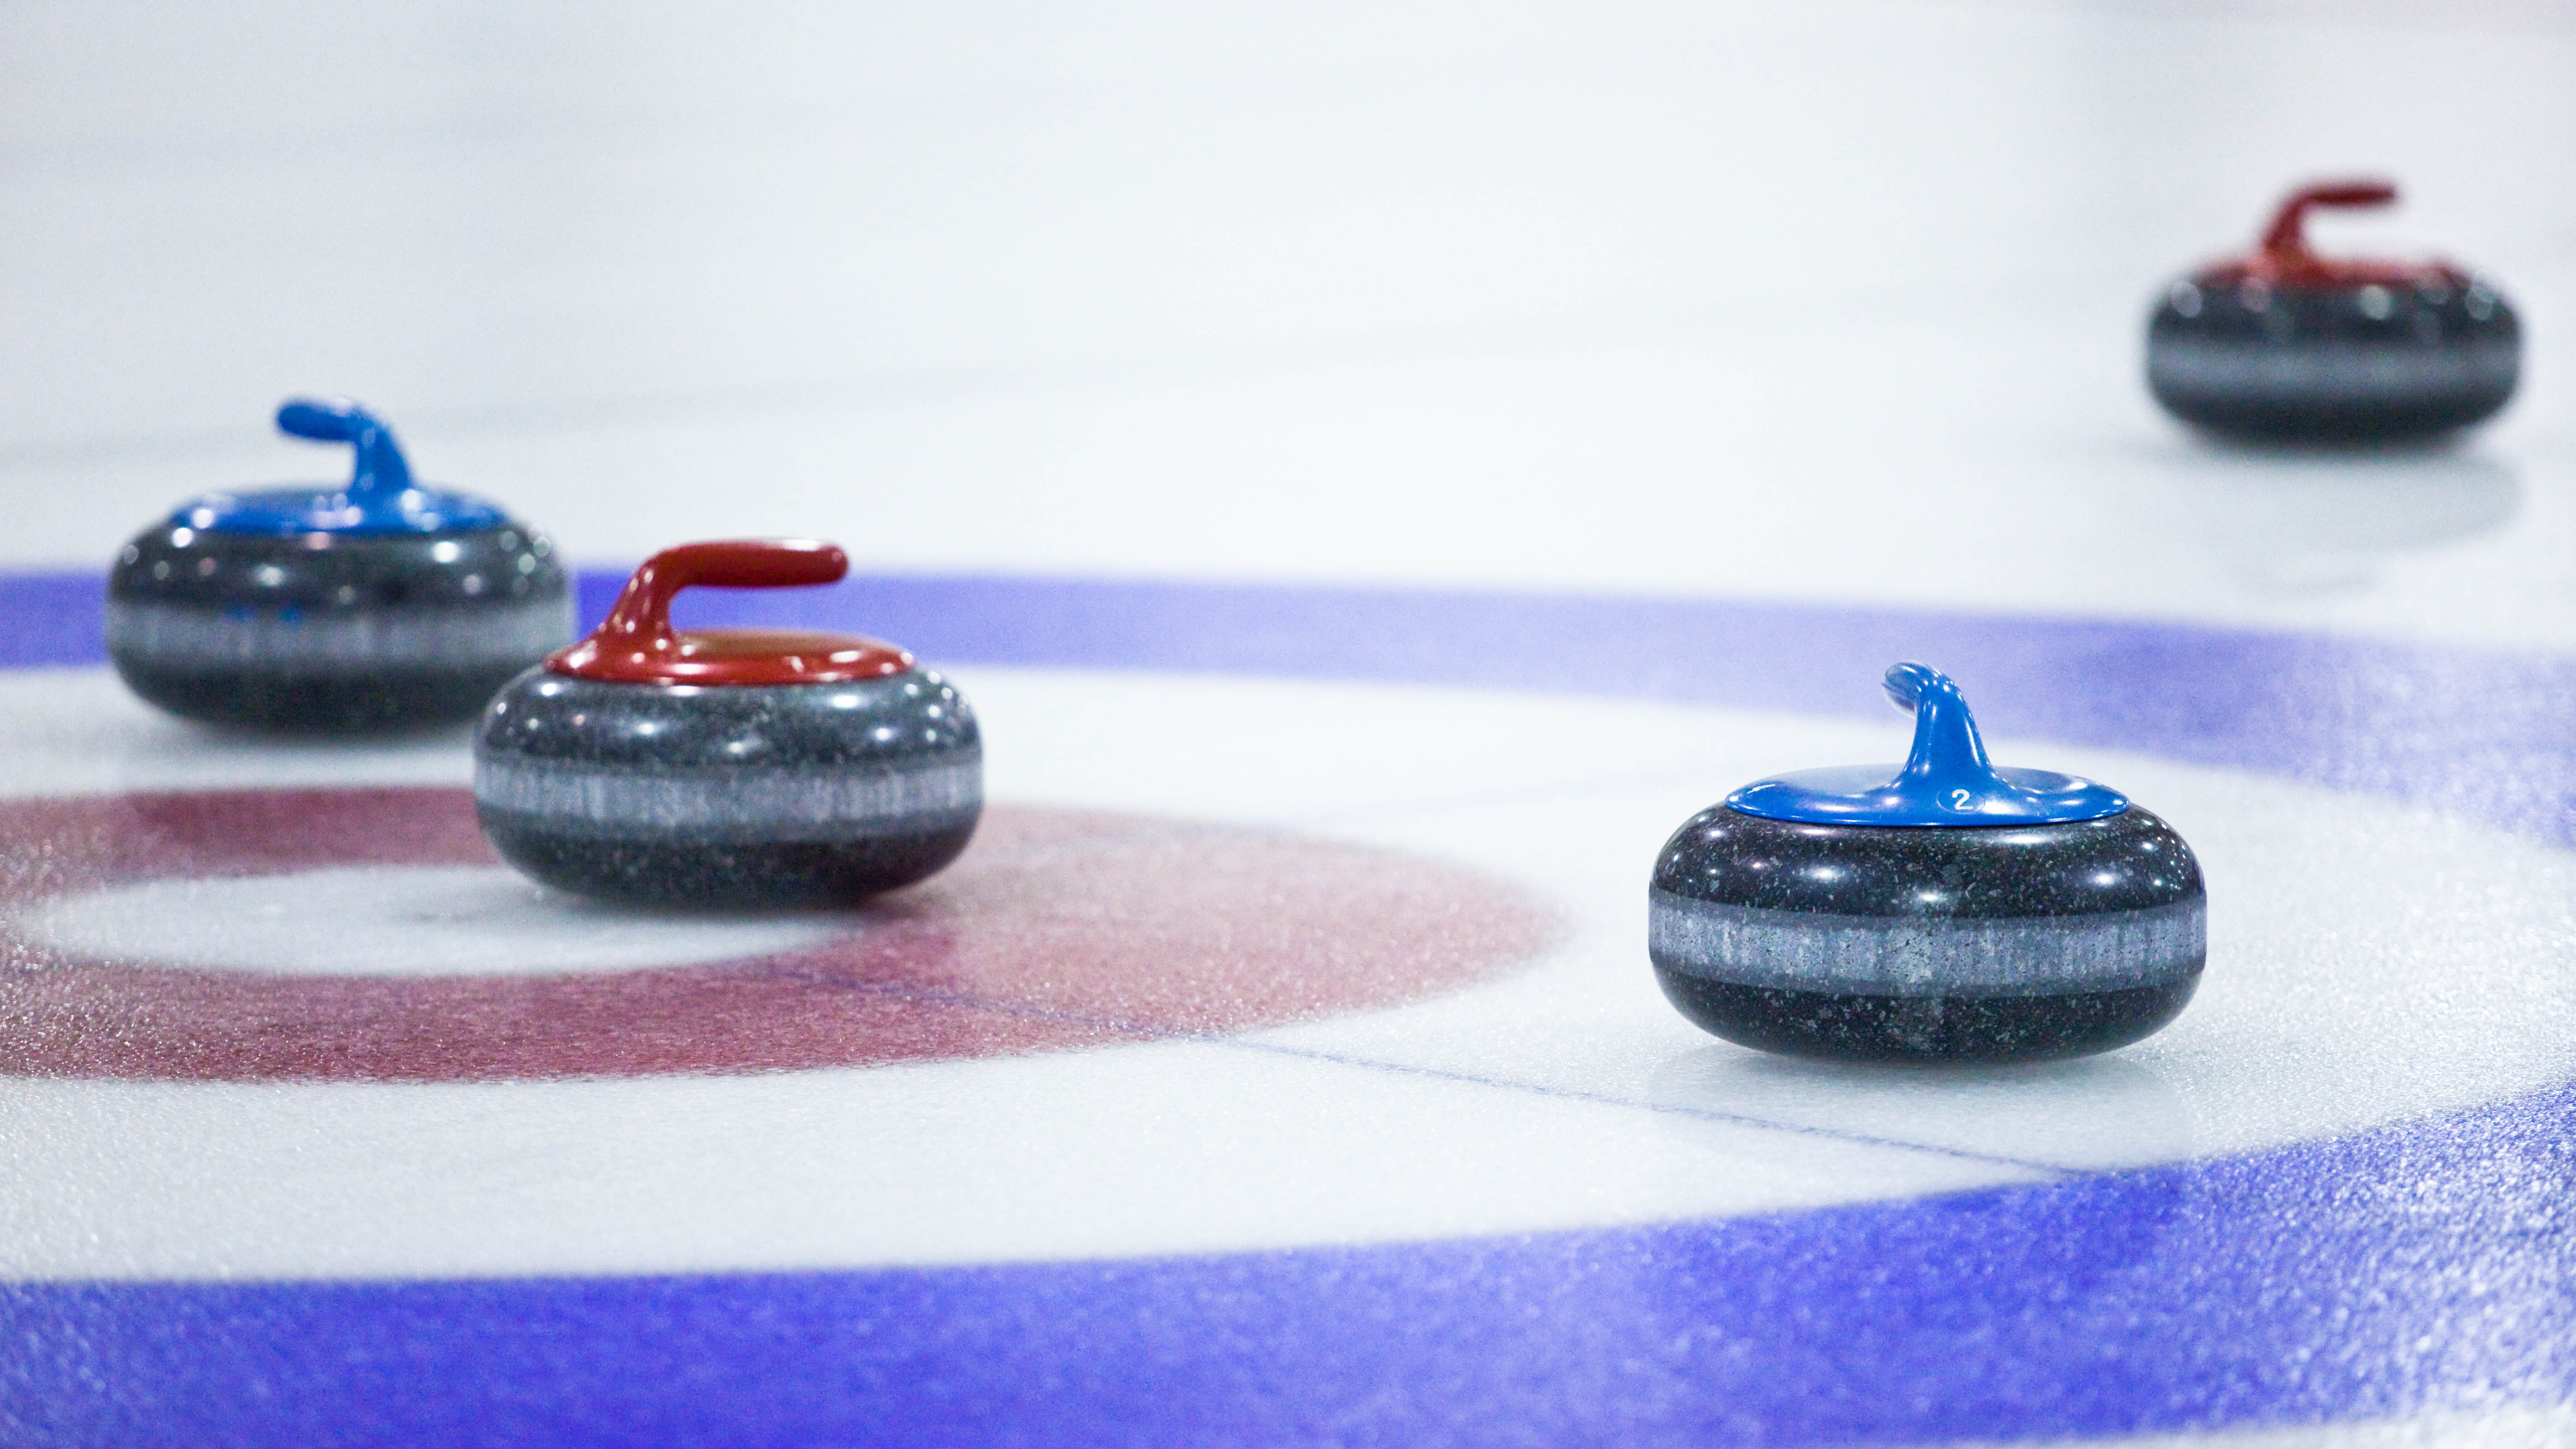 Curling rocks in play